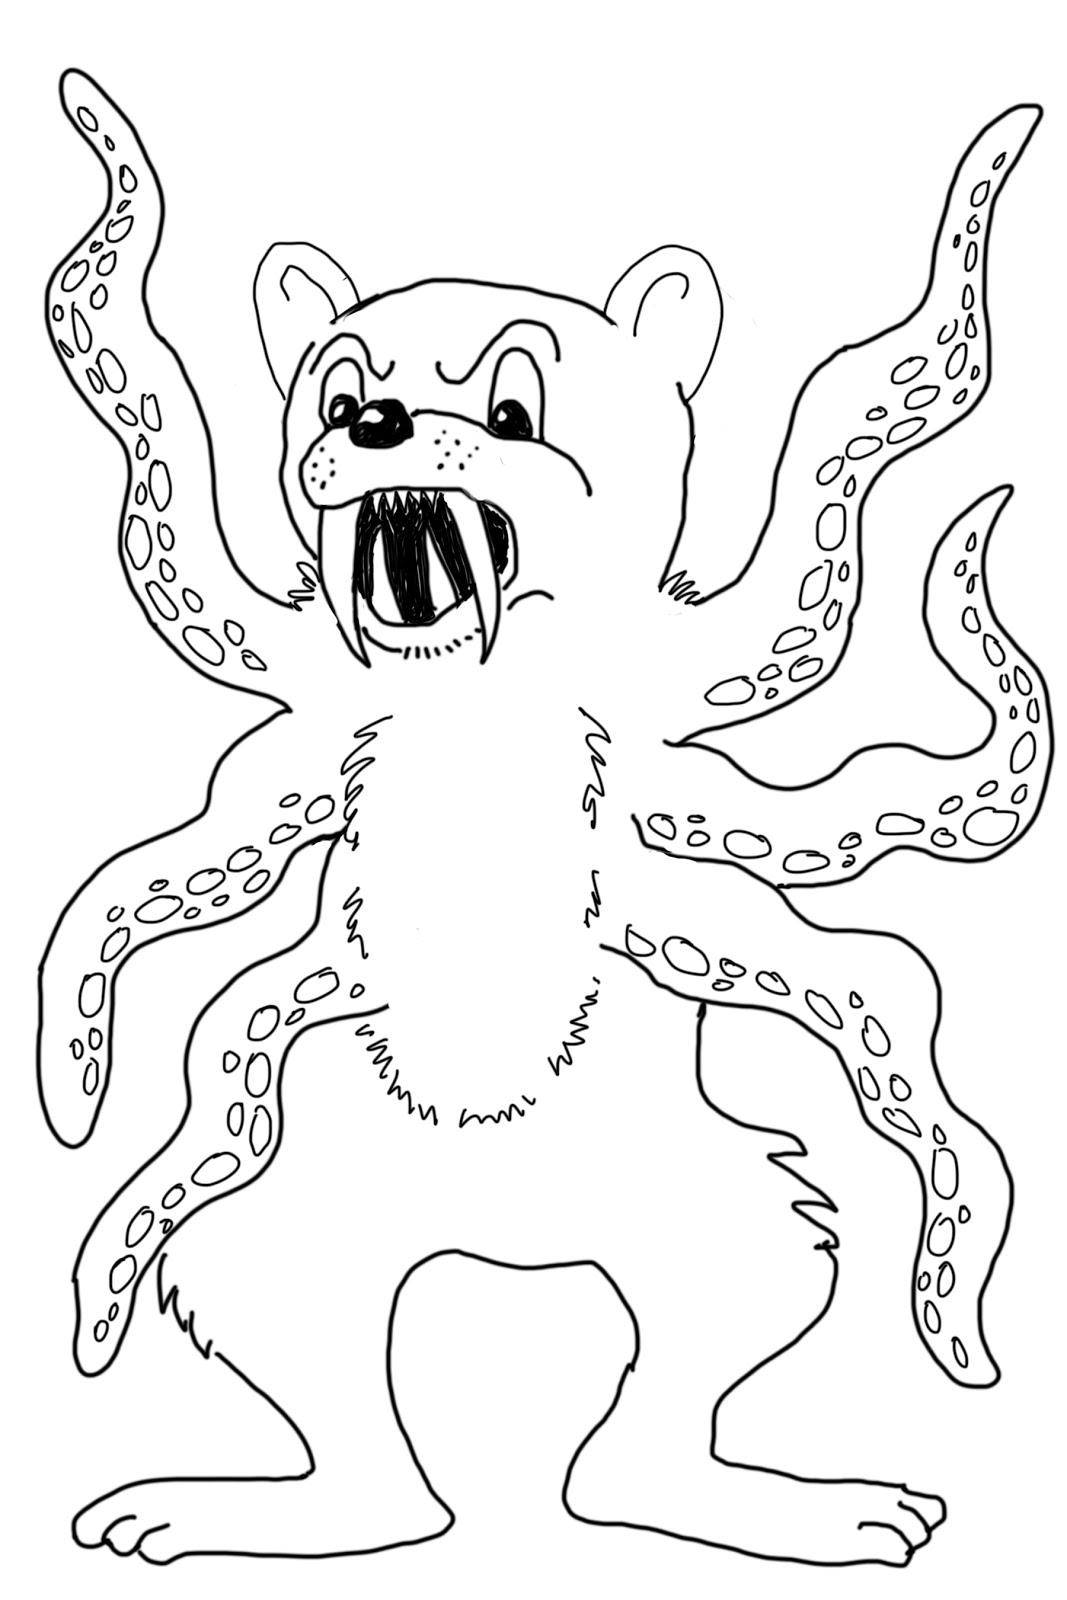 Tubster of Terror